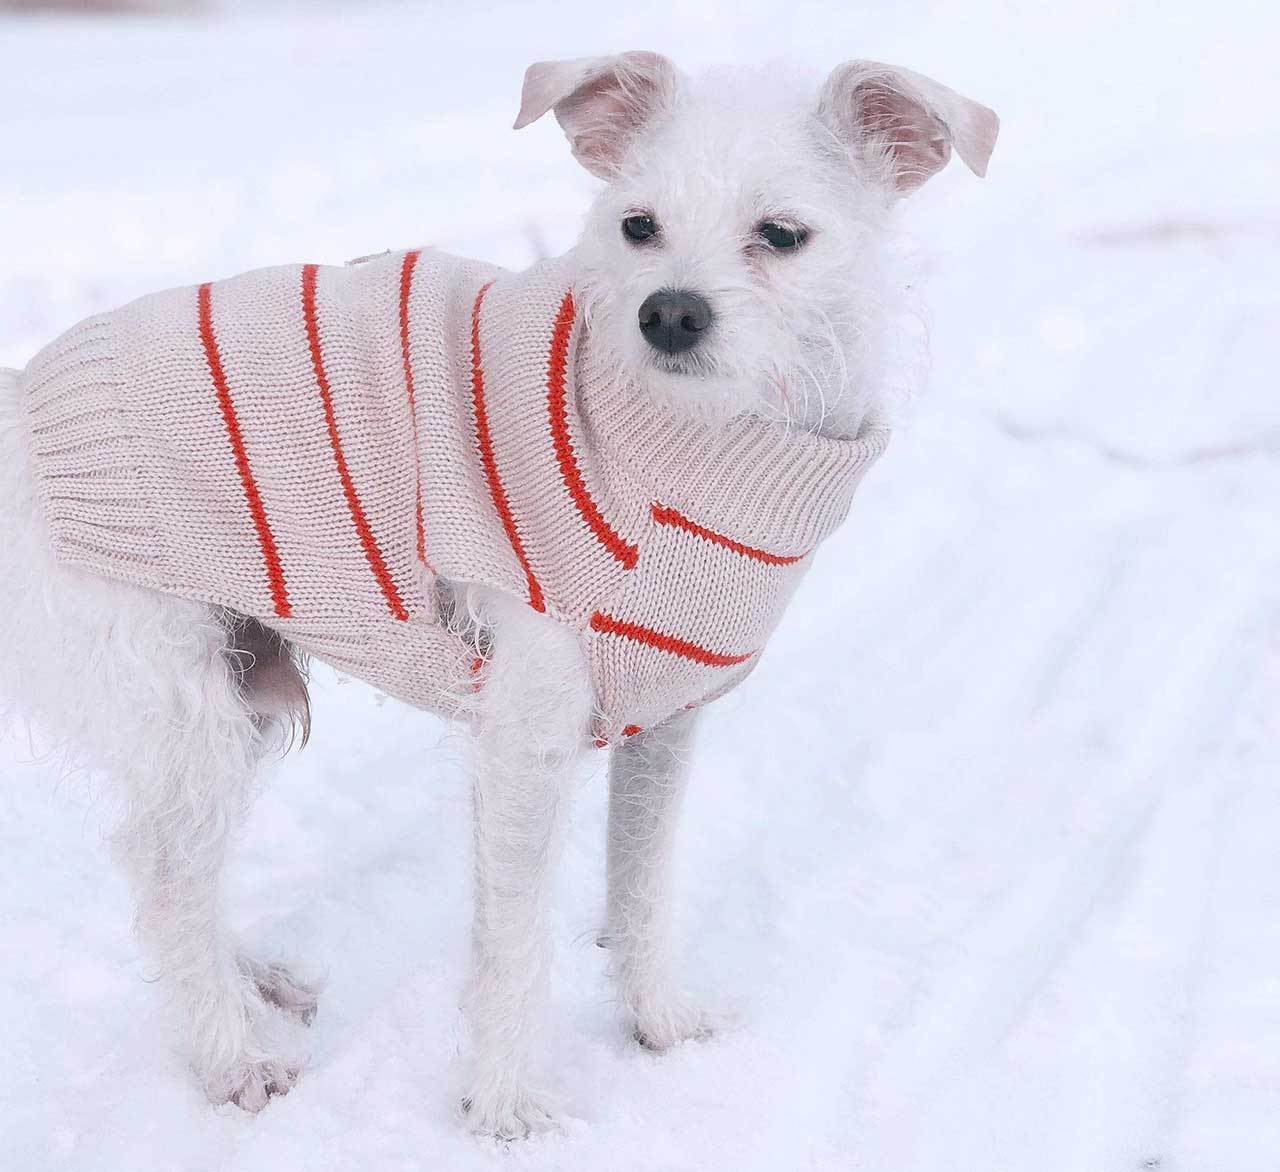 Little dog in Dog Threads sweater